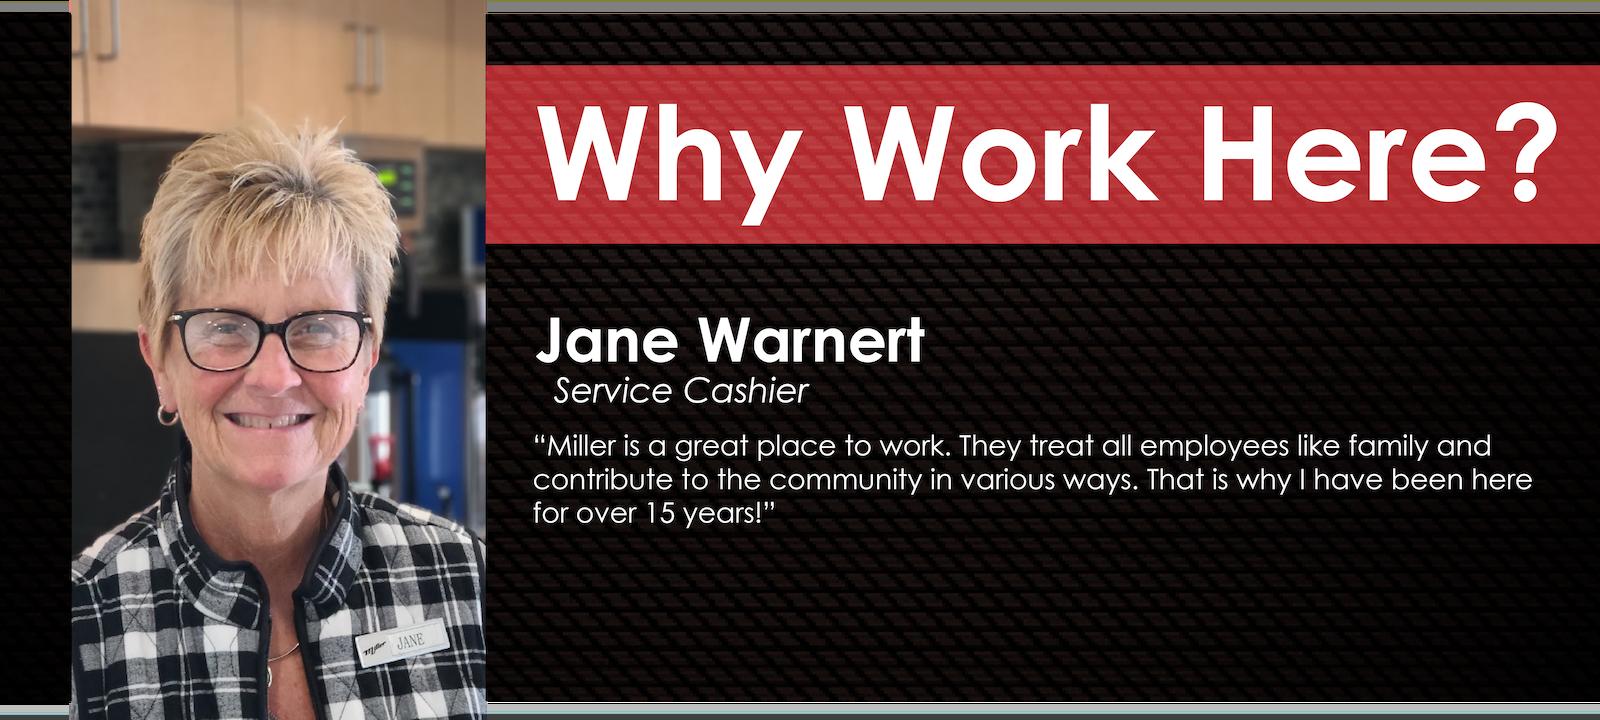 Jane Warnert